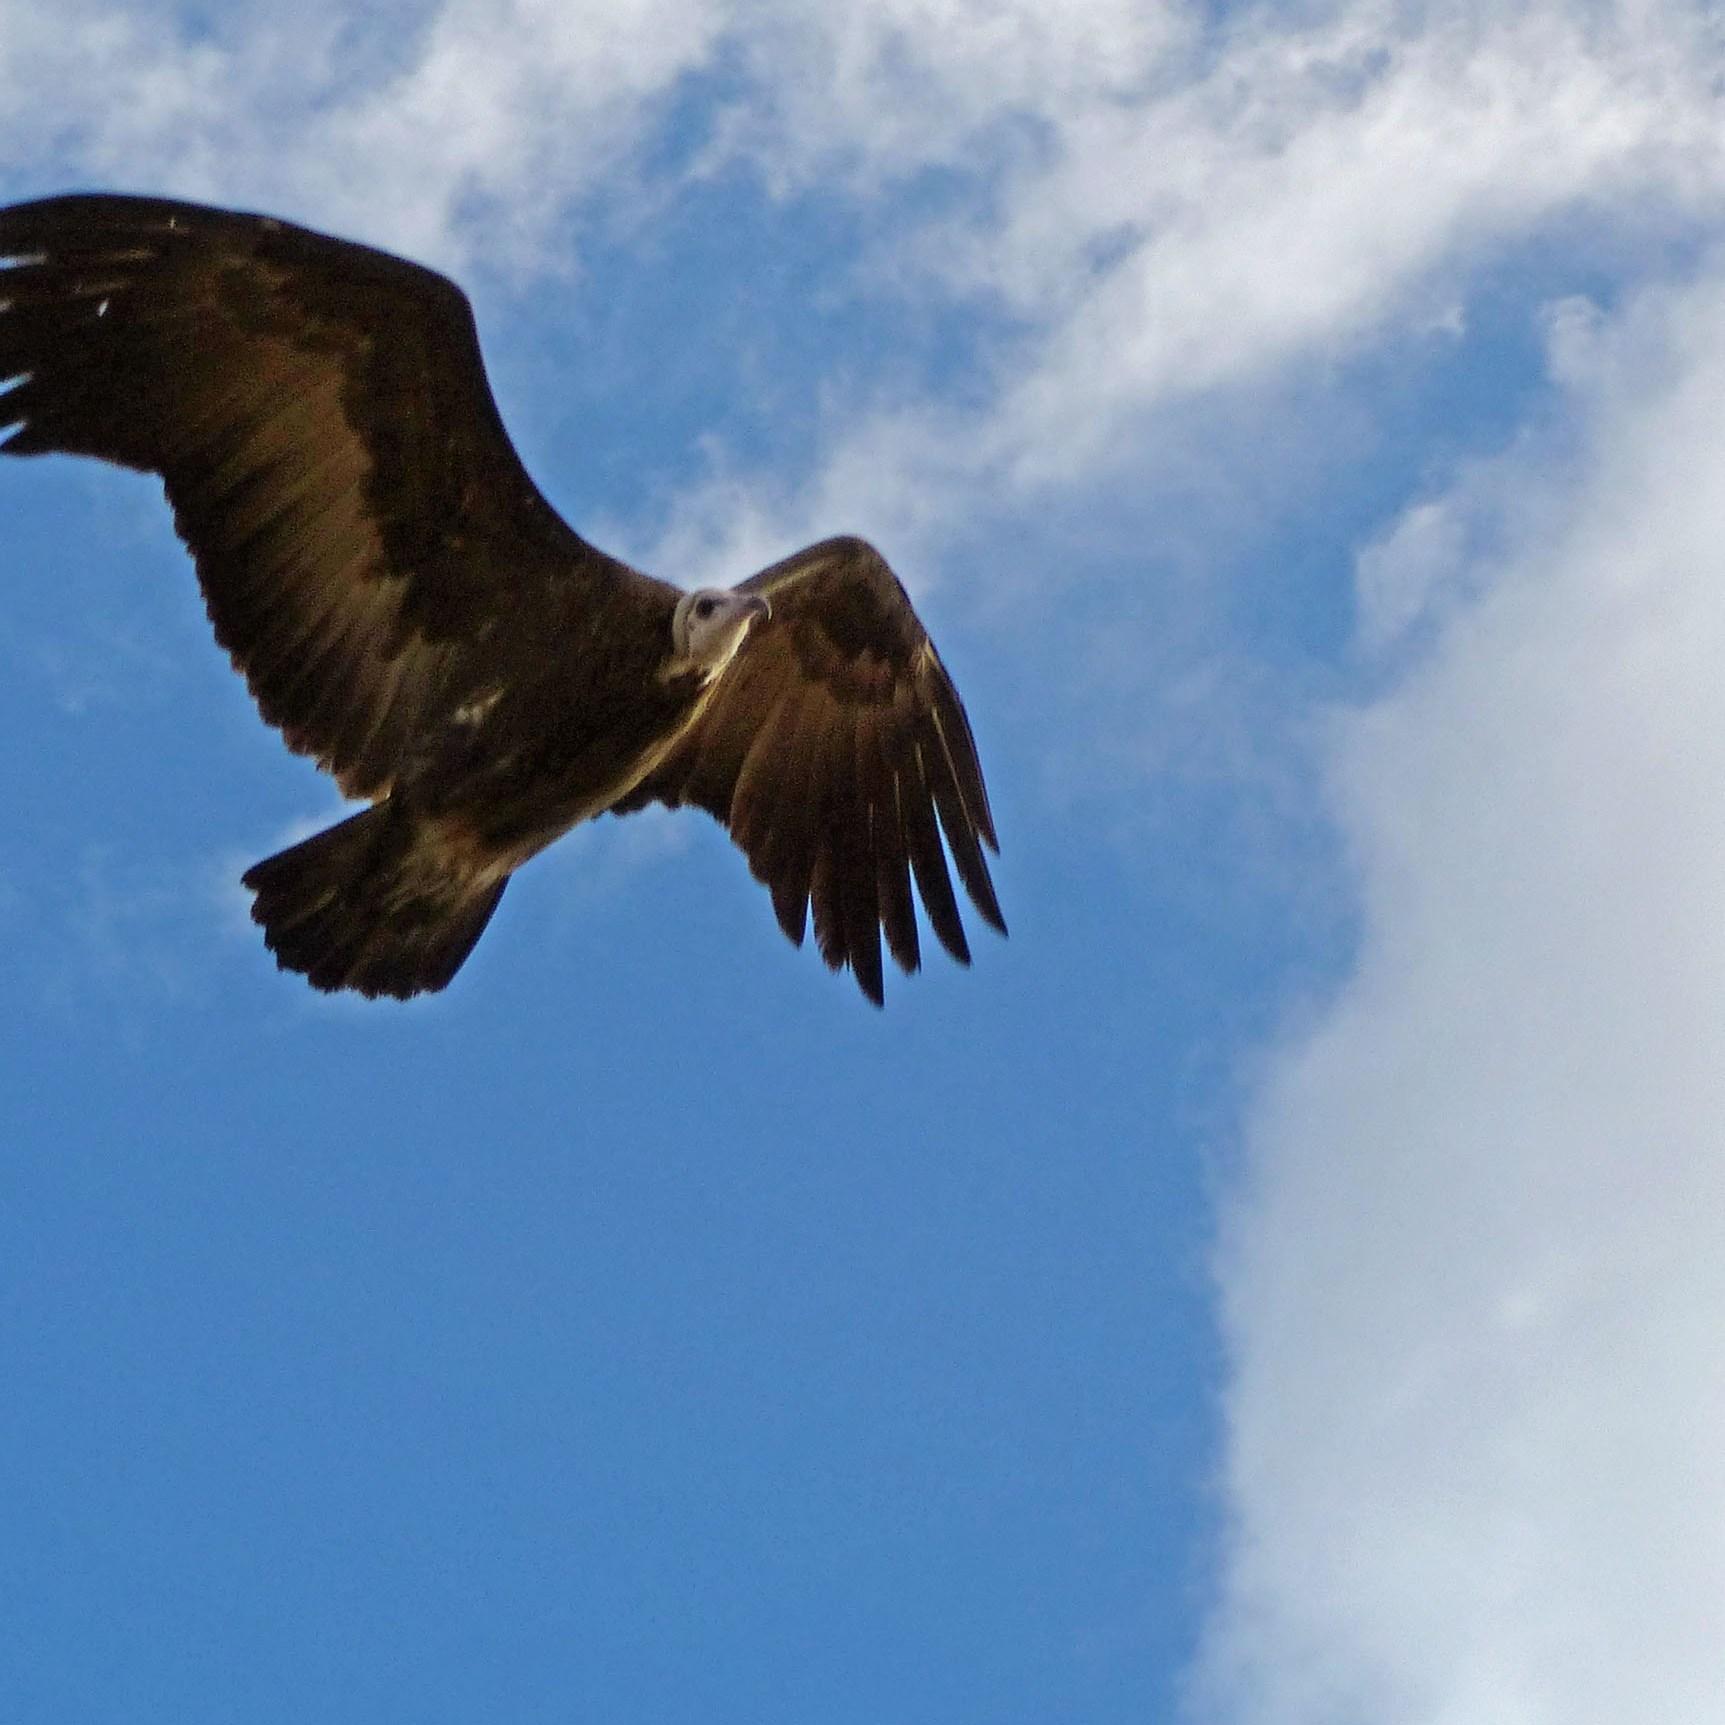 Bird flying overhead